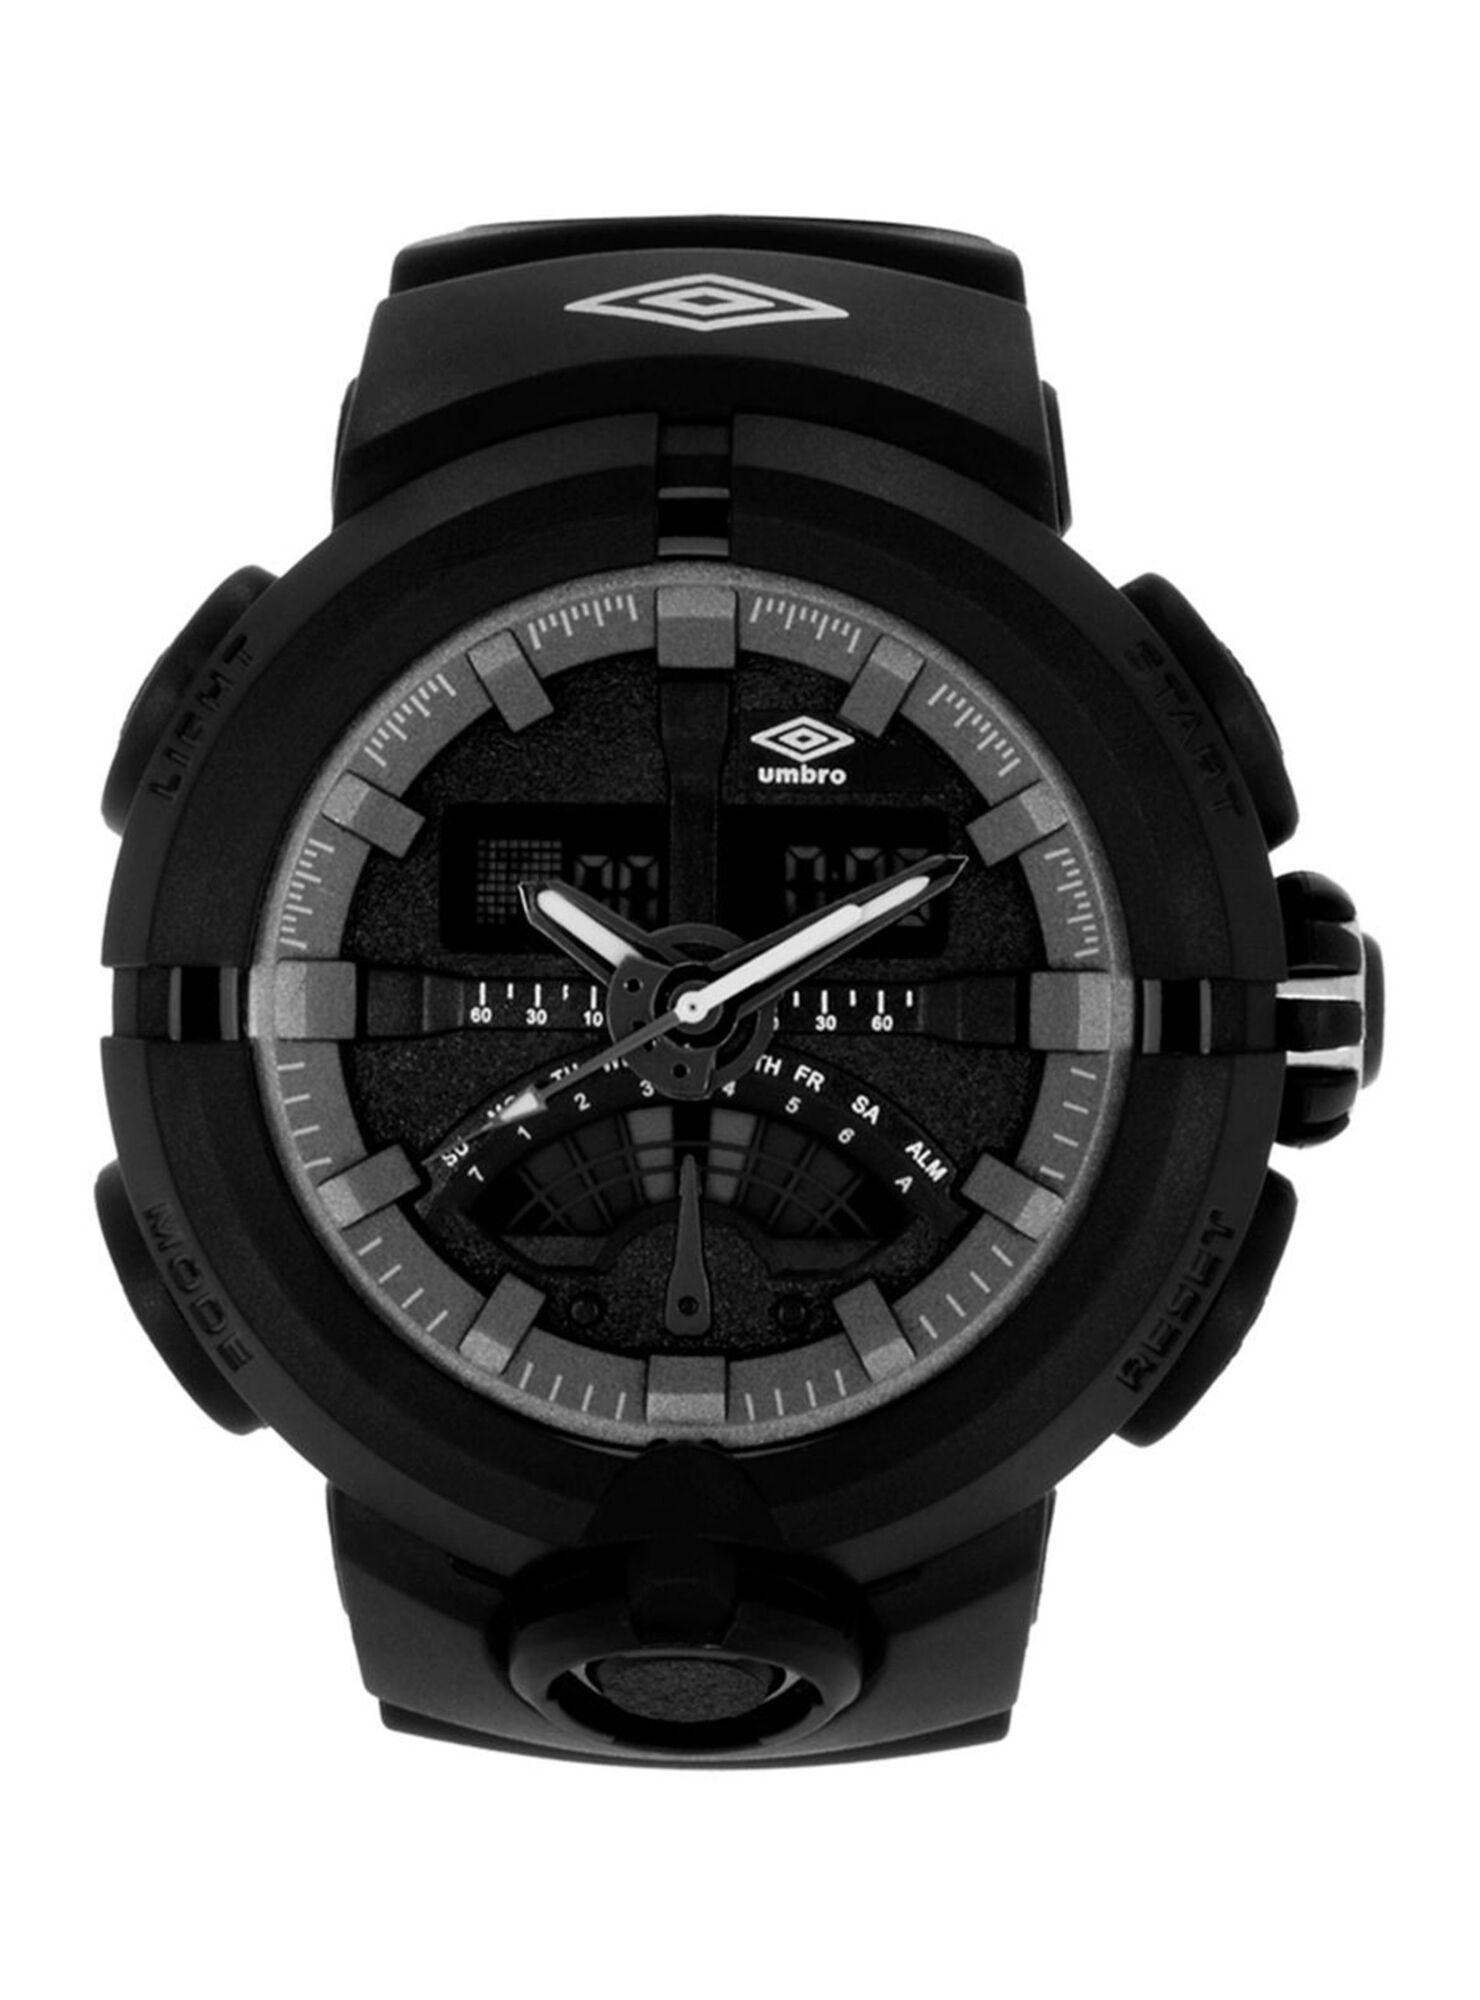 Reloj Análogo Digital Umbro UMB-082-5 Hombre - Relojes  e3aa9d5c6041c